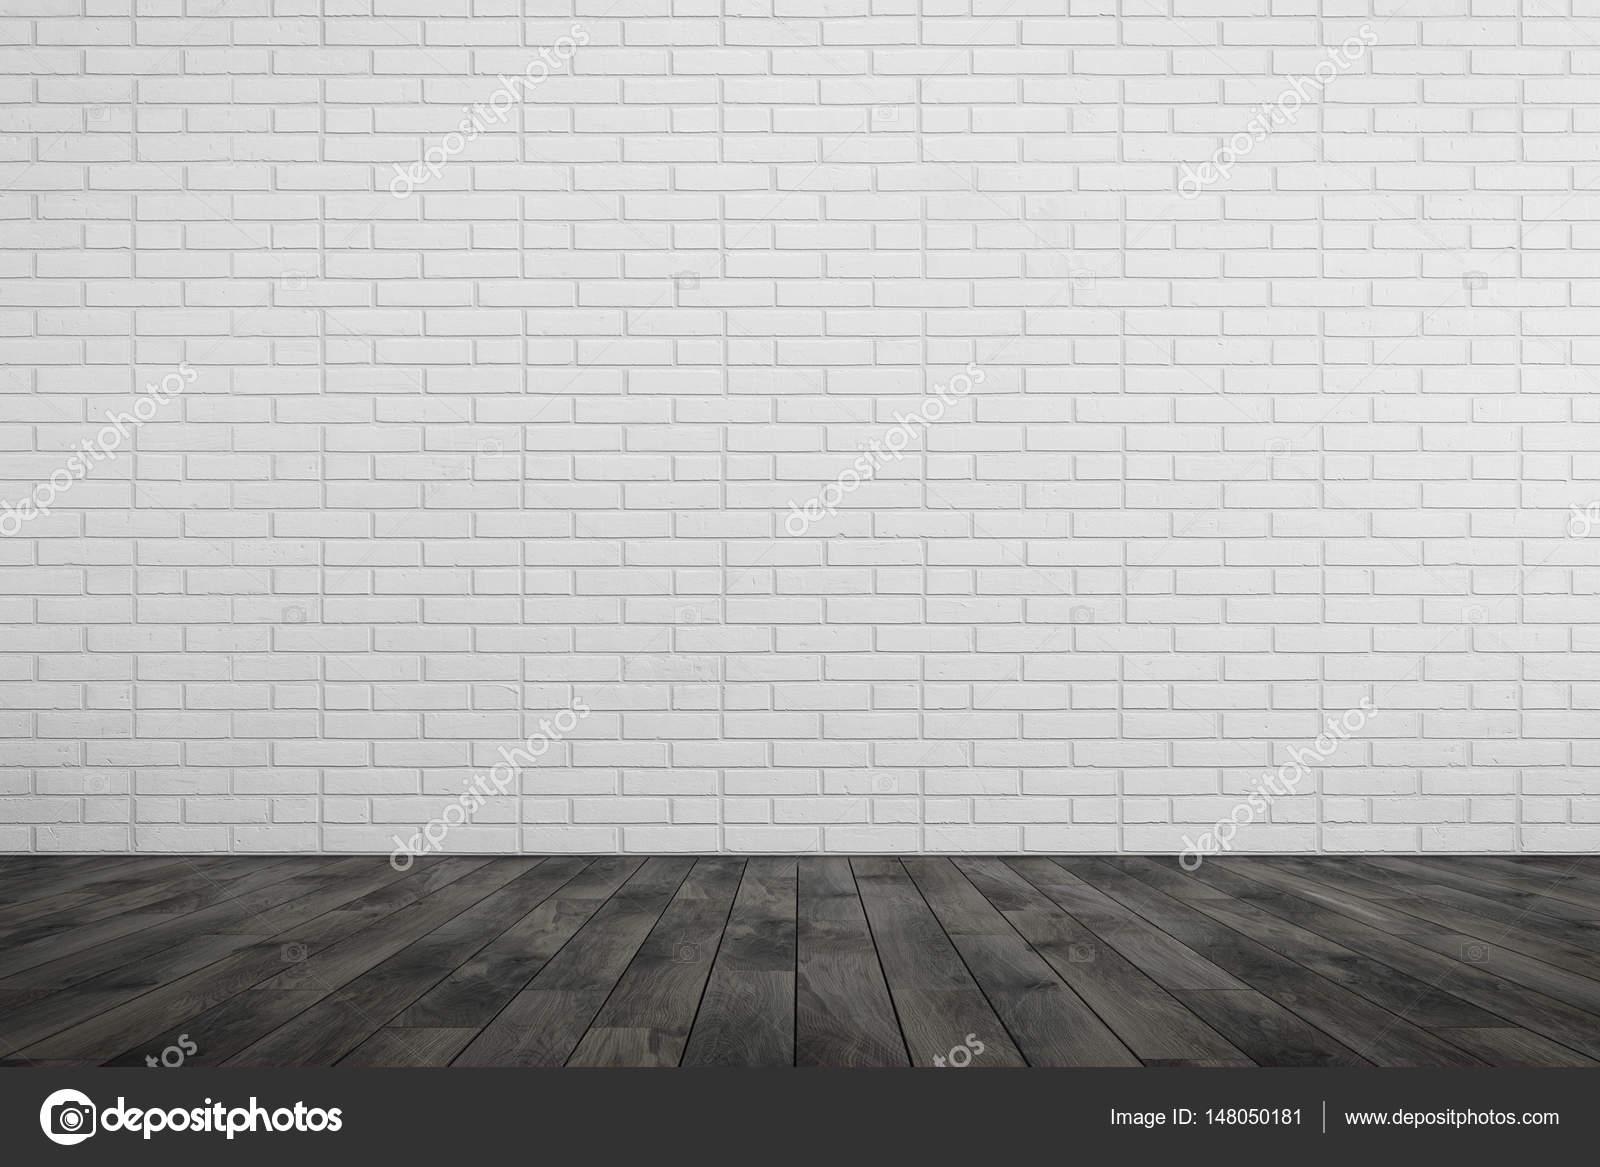 Lege ruimte witte bakstenen muur zwarte houten vloer u stockfoto